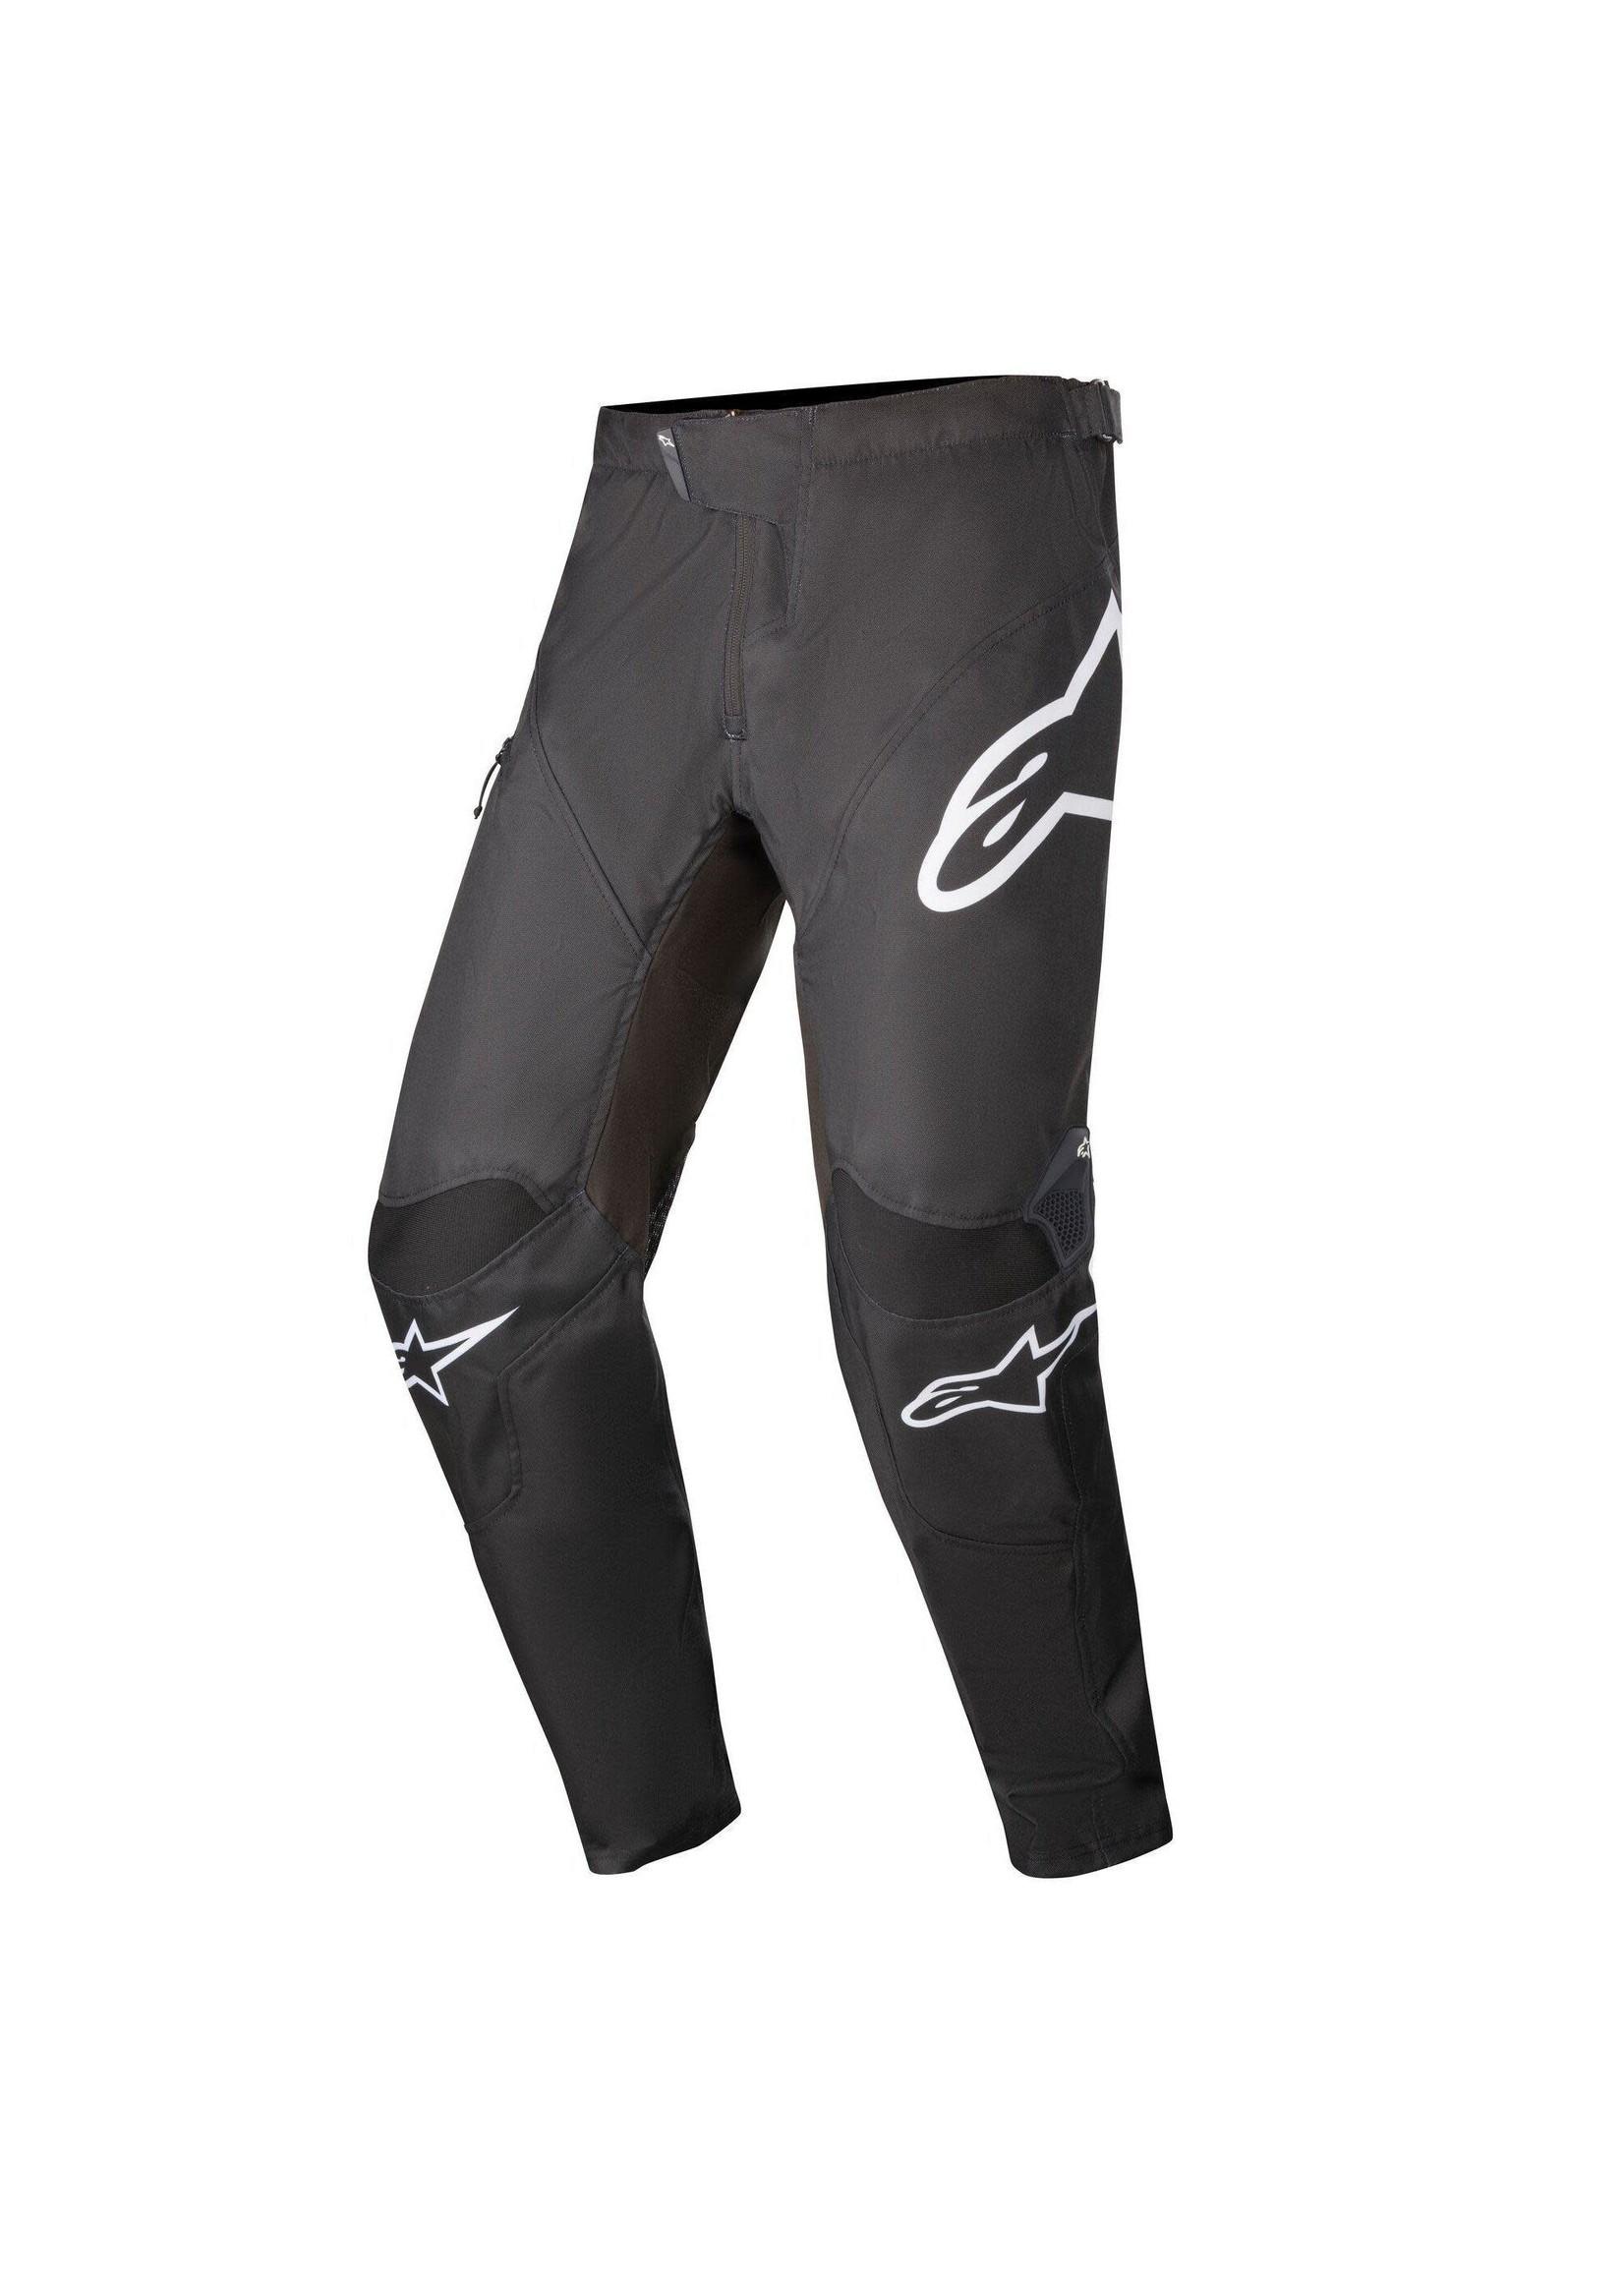 Alpine Stars Alpine Stars- Racer Pants, Black/Wht, 32